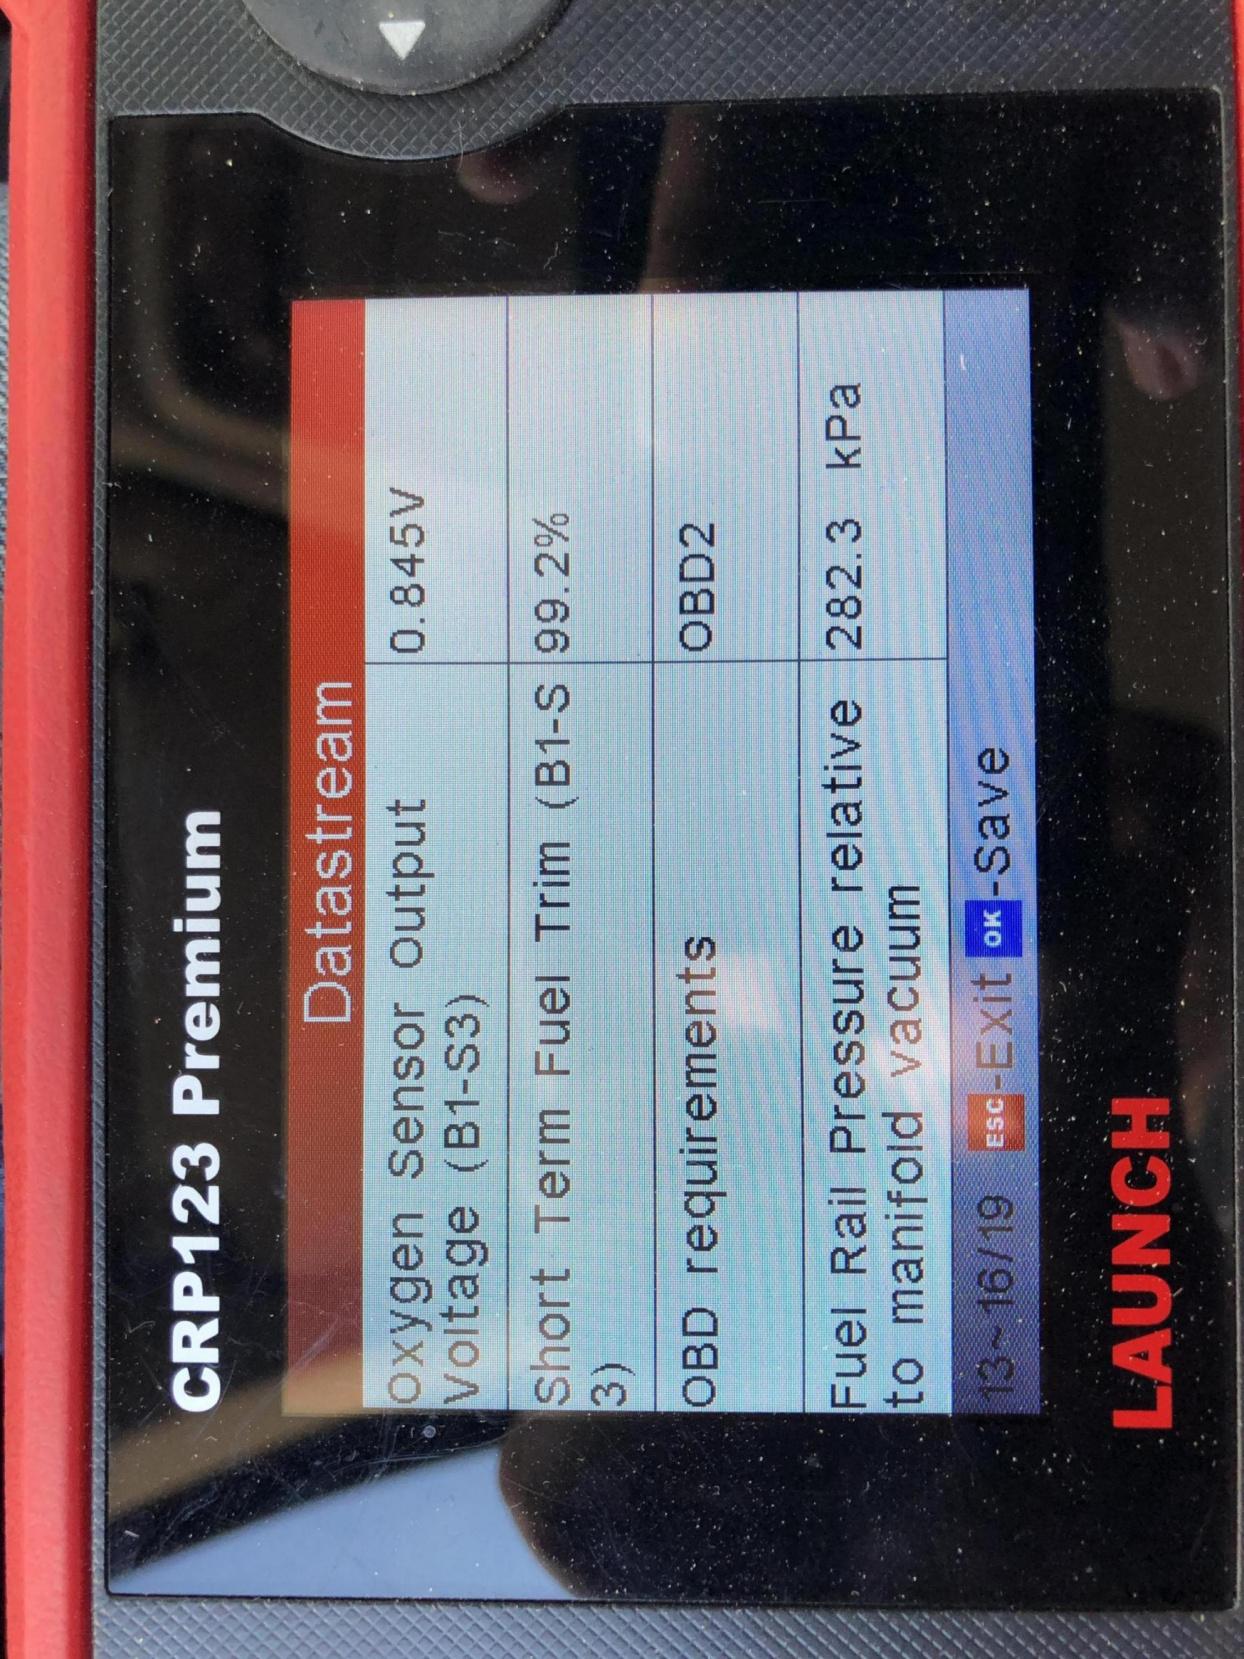 Code P0171 System too Lean. (not the PCV hose)-048f77cc-bc83-49f5-ae8b-c6dd673e24c9_1562105725679.jpg